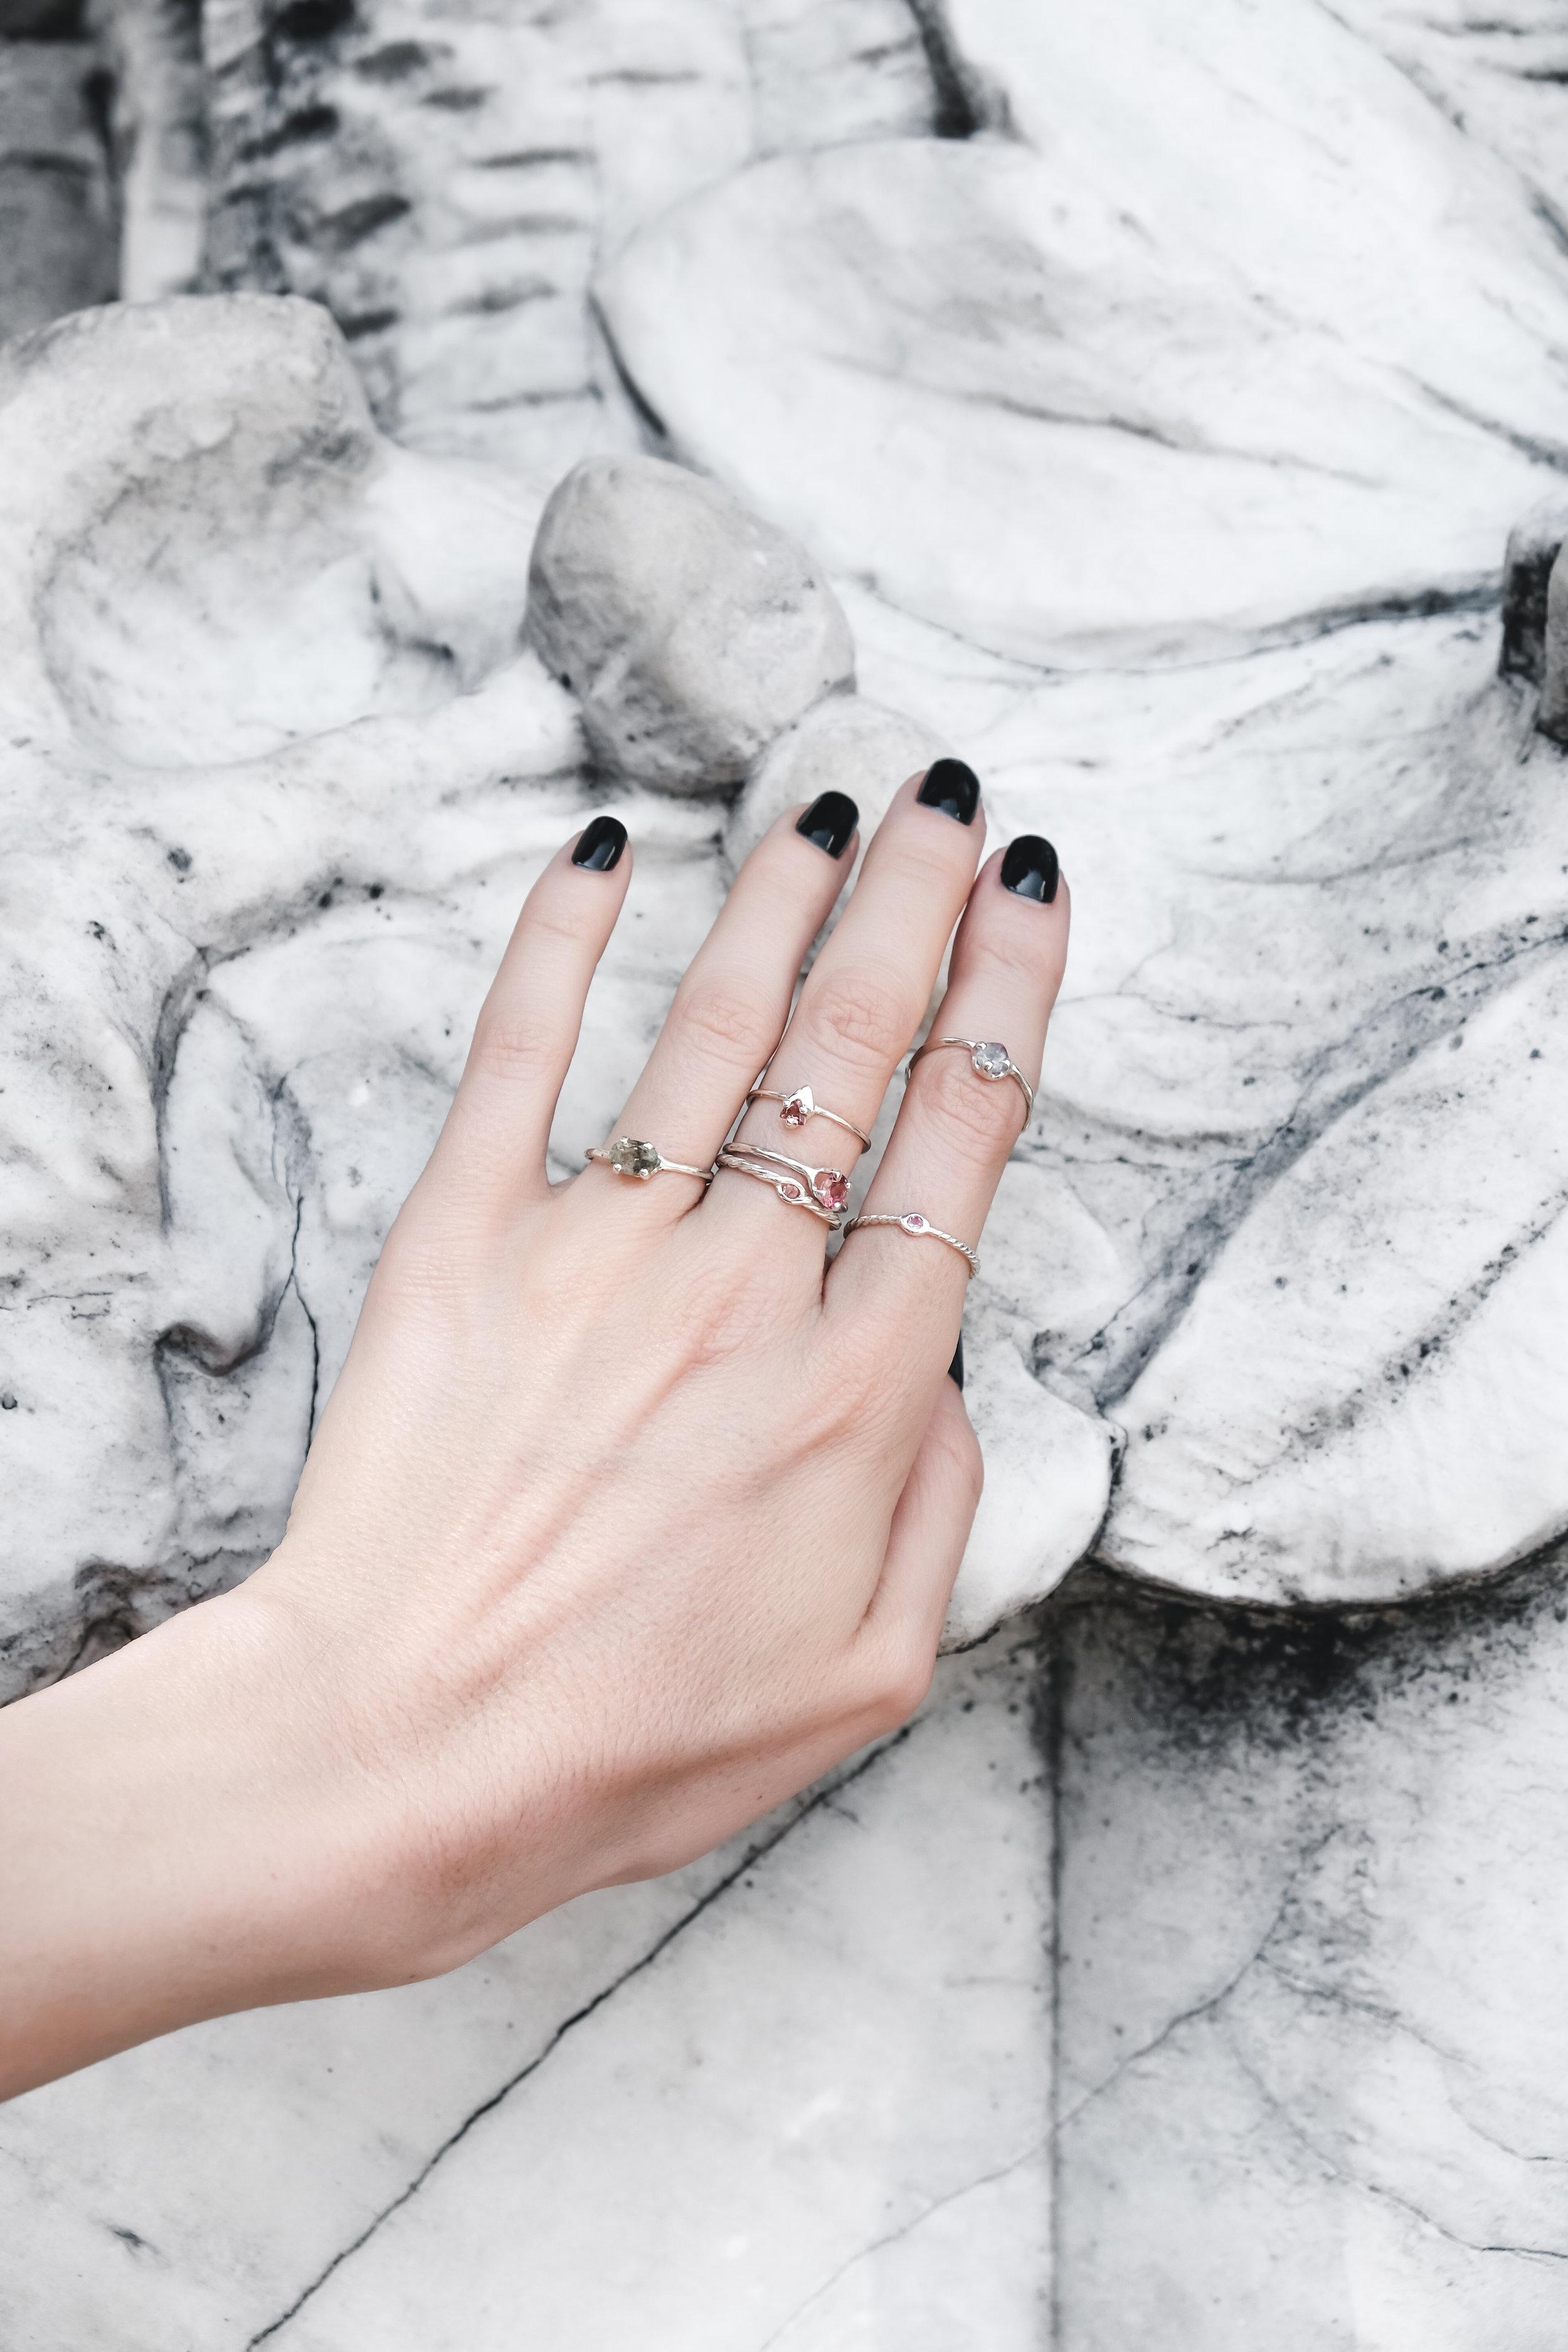 silver-jewelry-rings-tourmaline-the-black-alchemy-1-2.jpg